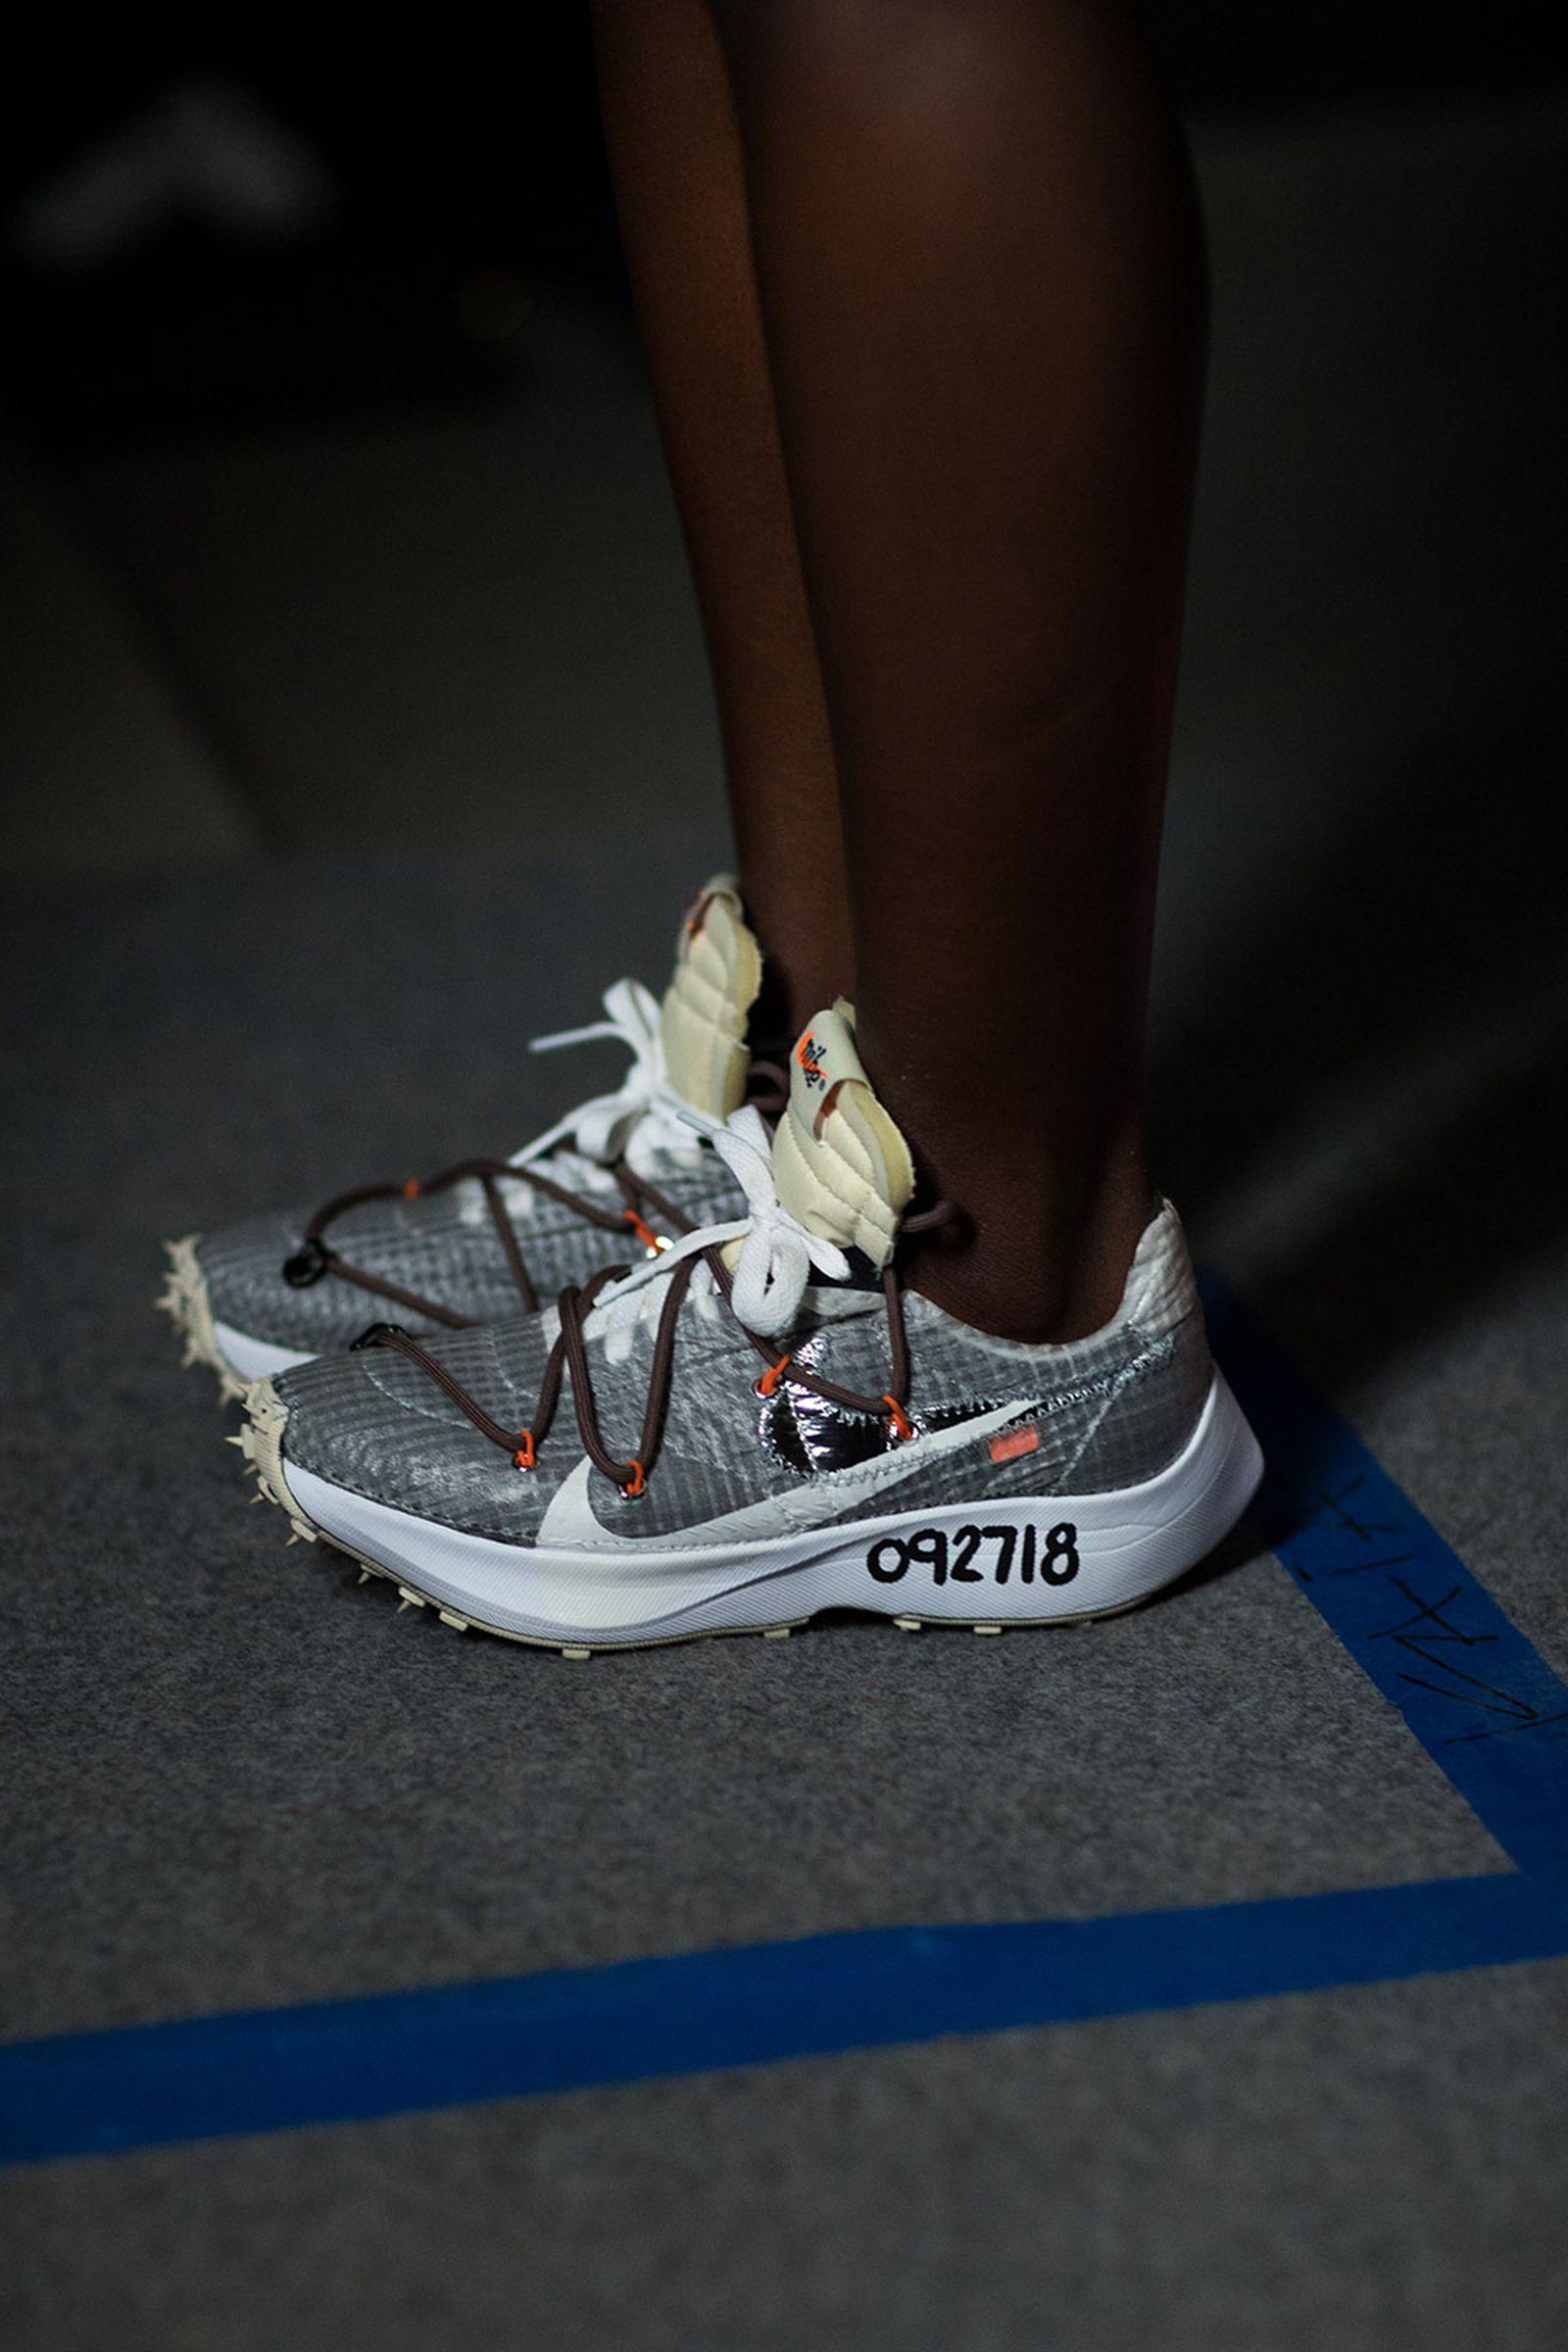 off white pfw ss19 footwear closer look Nike OFF-WHITE c/o Virgil Abloh Paris Fashion Week SS19